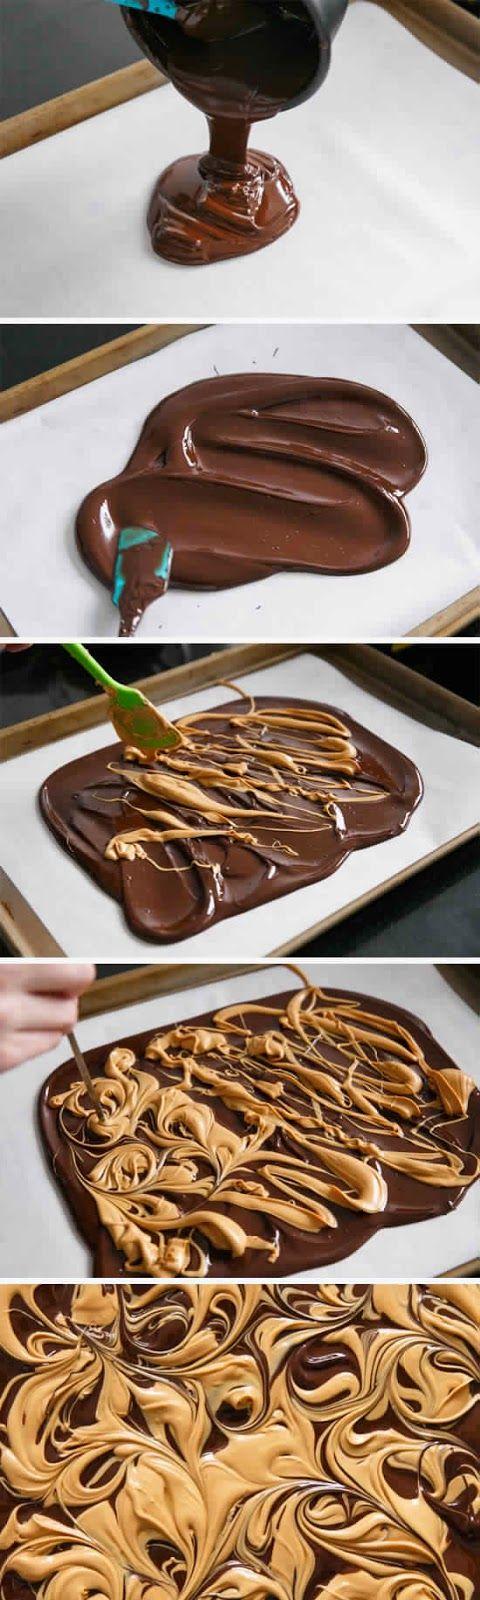 Chocolate Peanut Butter Cup Bark - Yummy !